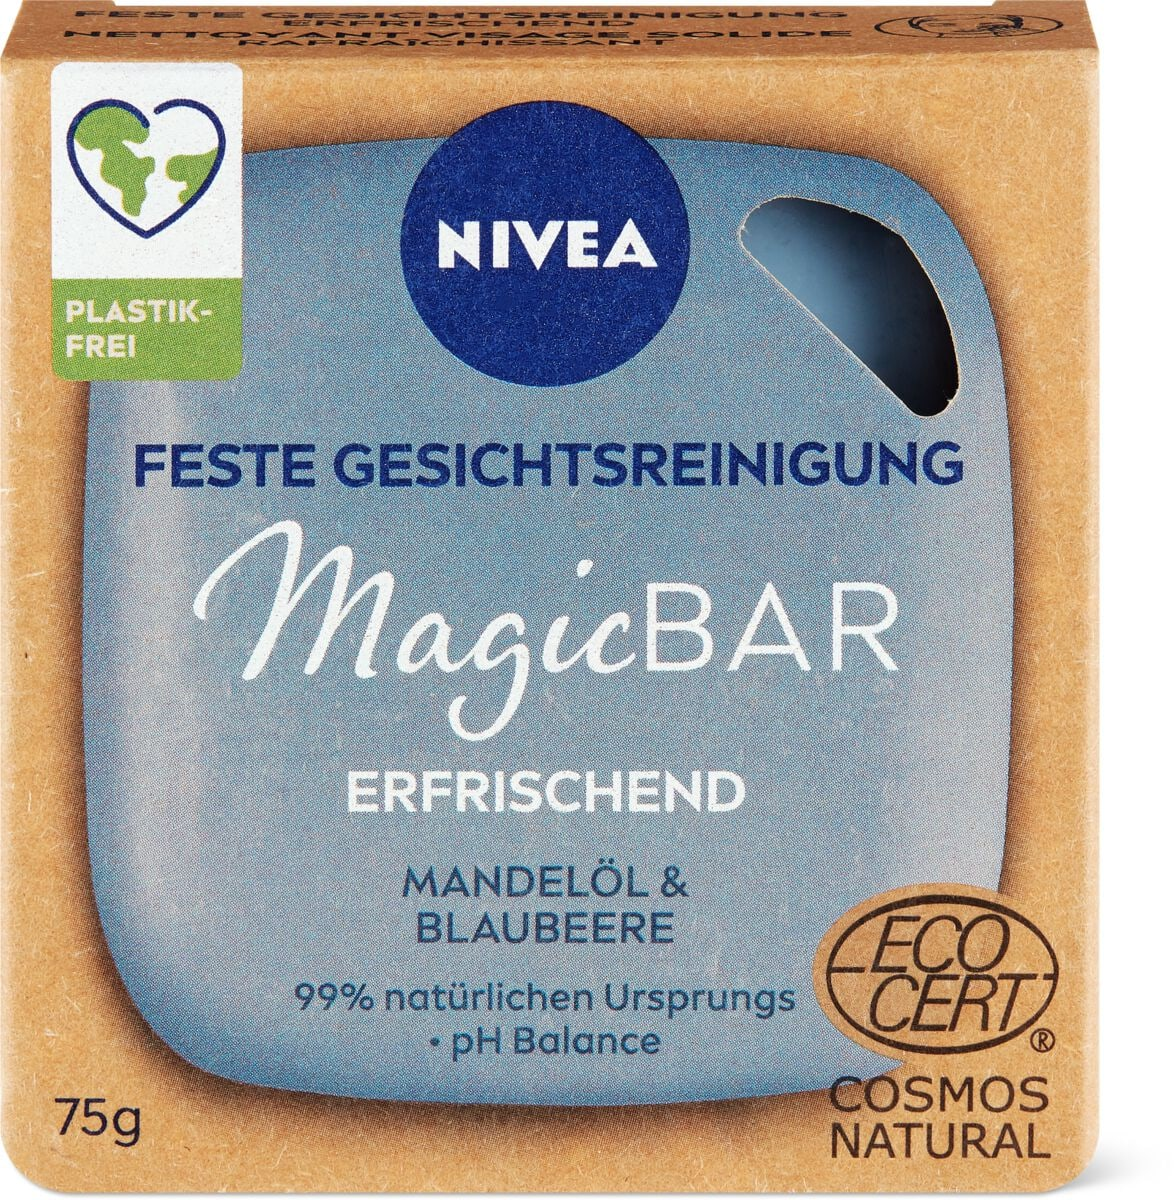 Nivea Magic Bar Rafraichissant